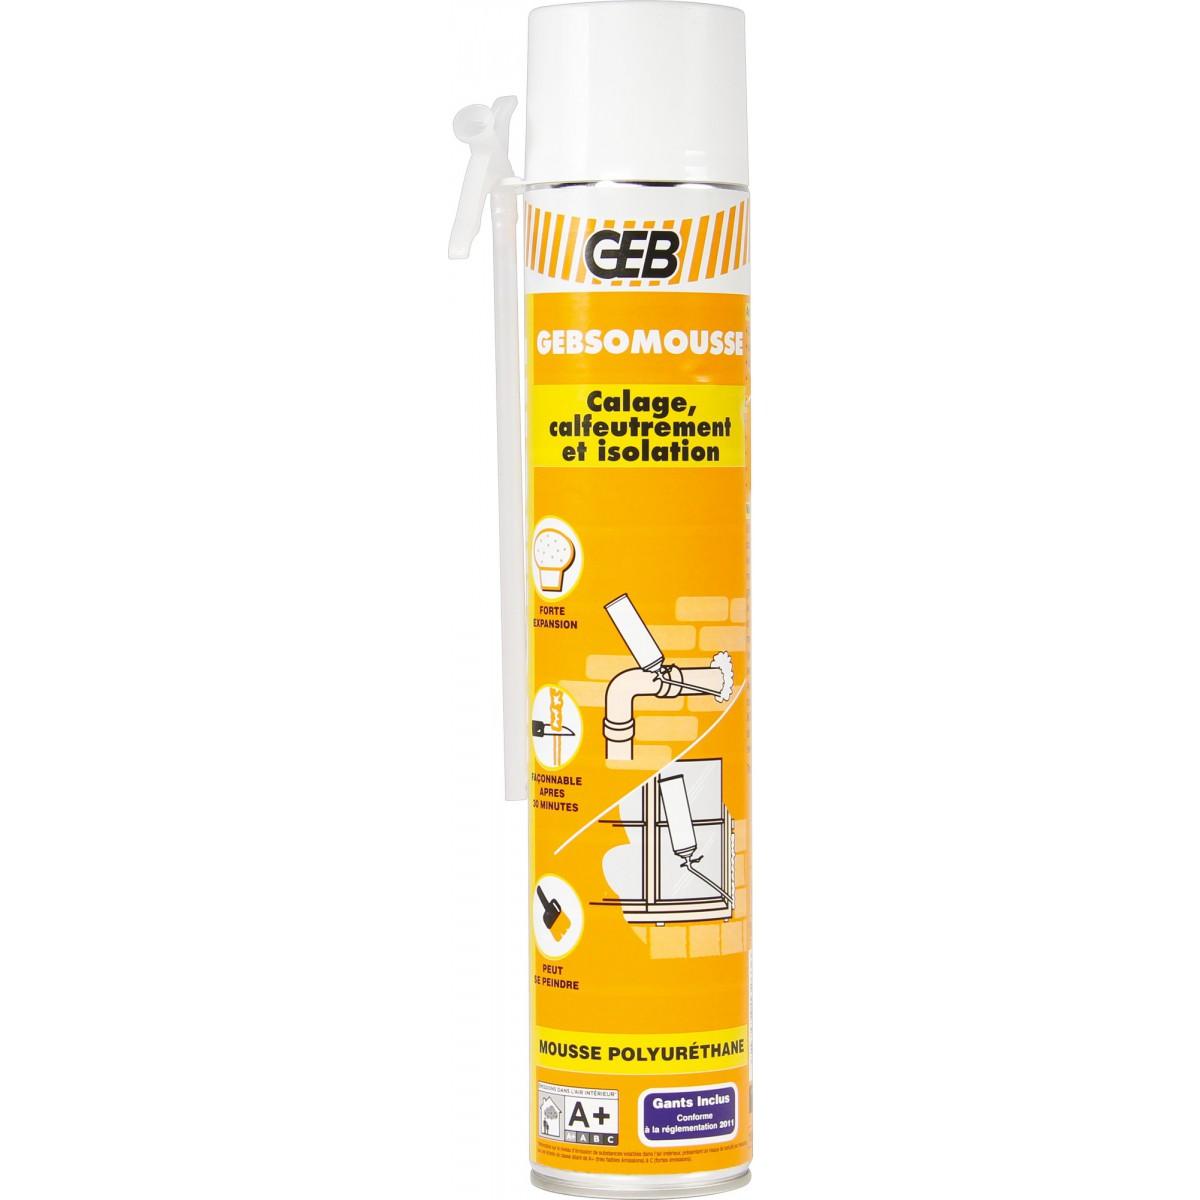 Mousse polyuréthane Gebsomousse - Aérosol 750 ml - Avec gants